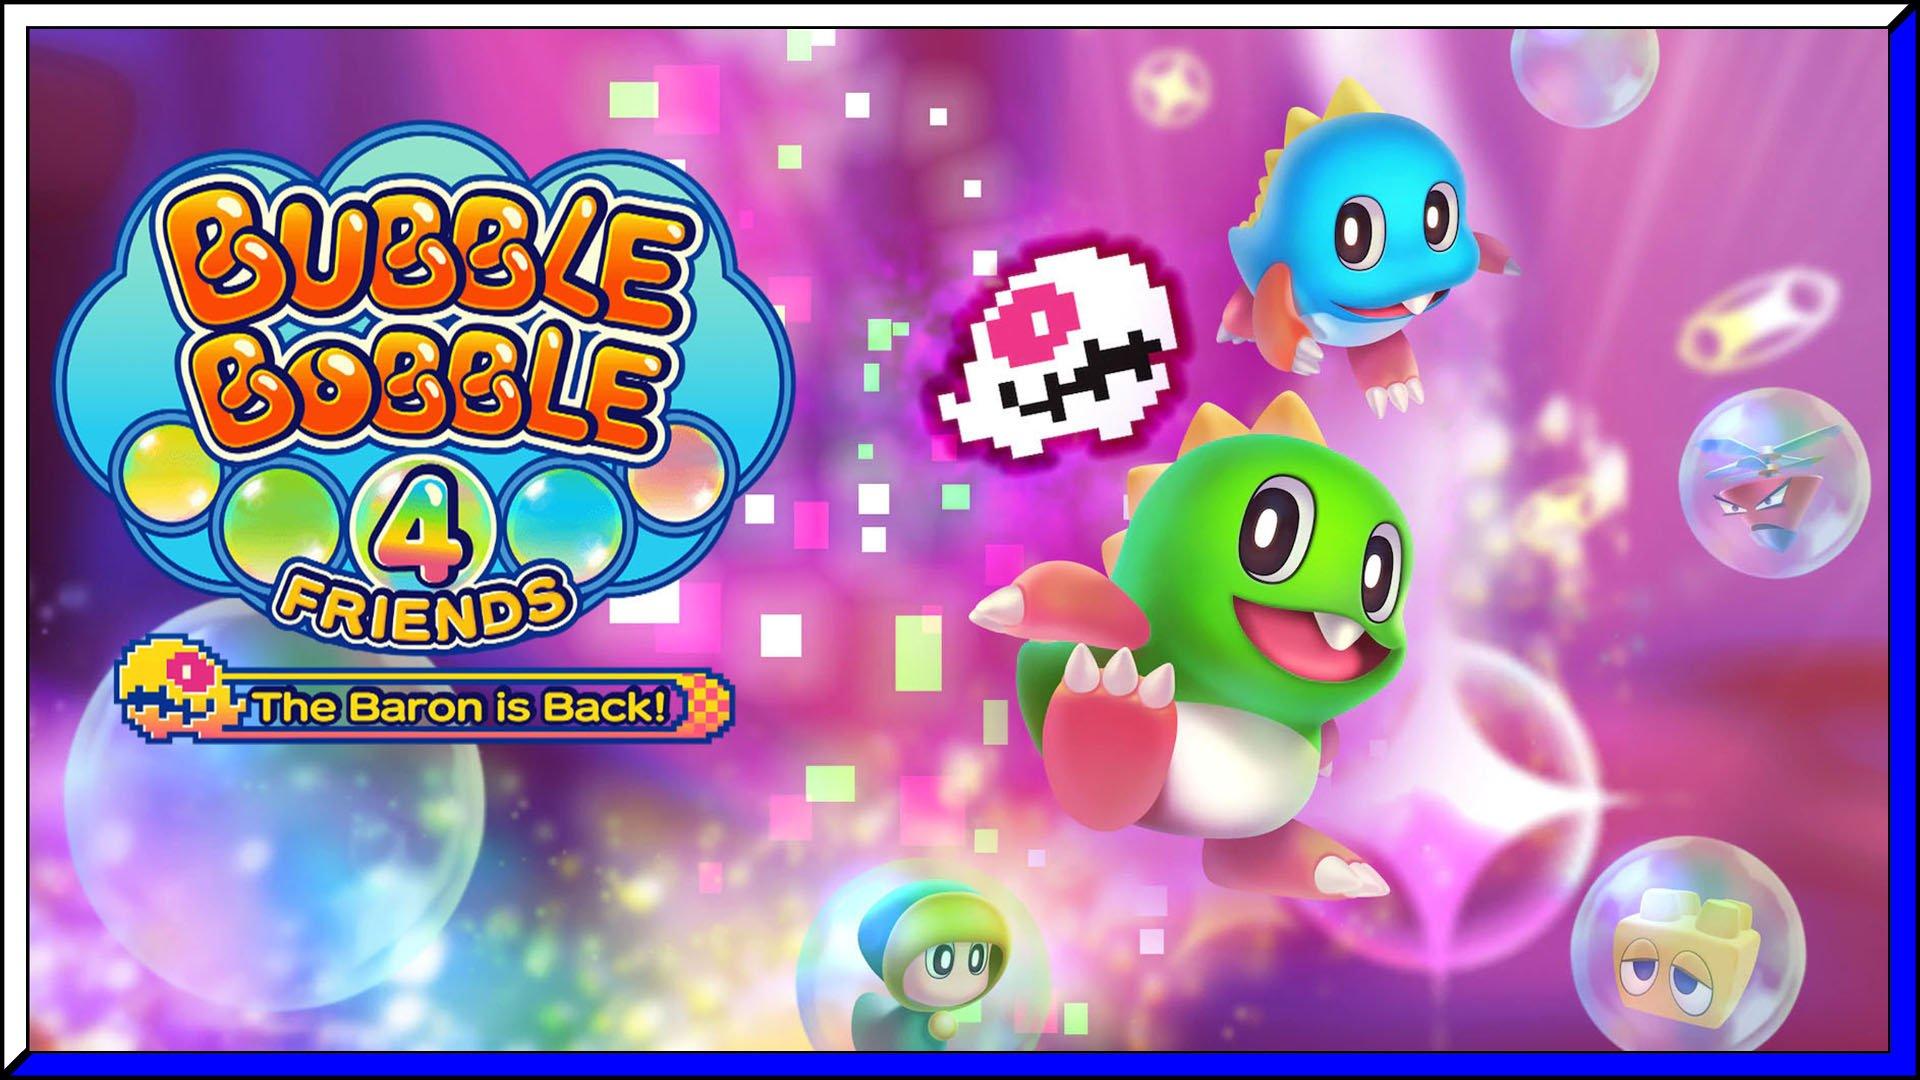 Bubble Bobble 4 Friends The Baron Is Back Fi3